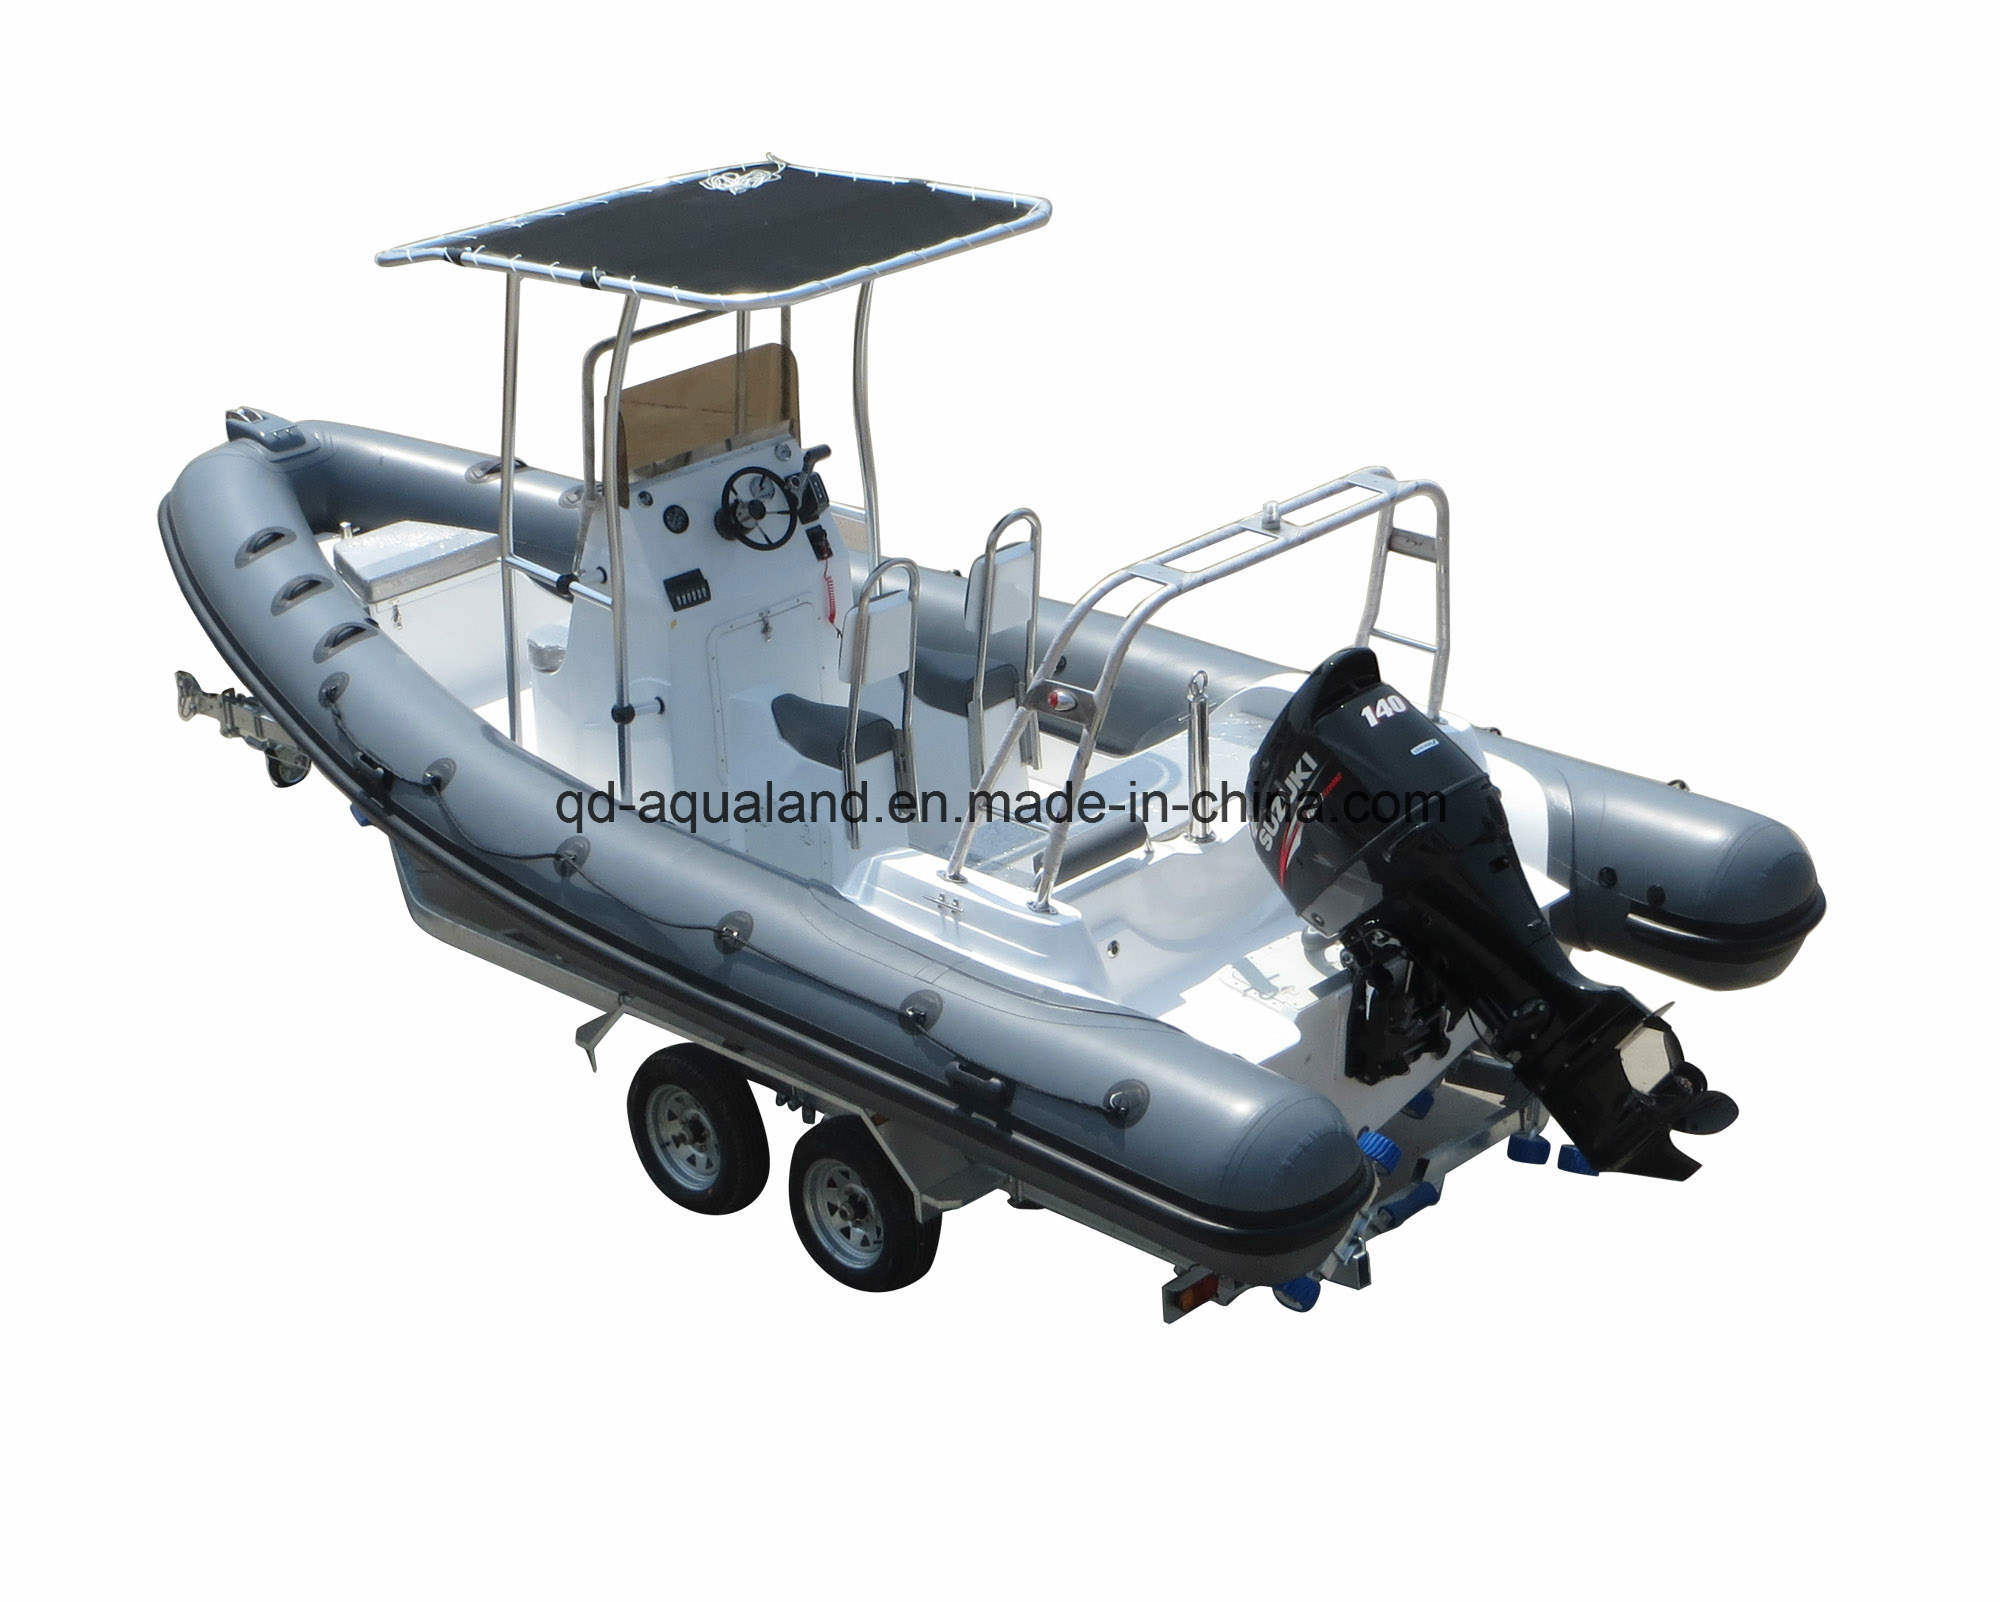 Aqualand 21feet 6.5m Rib Motor Boat/Rigid Inflatable Rescue Boat (RIB660B)